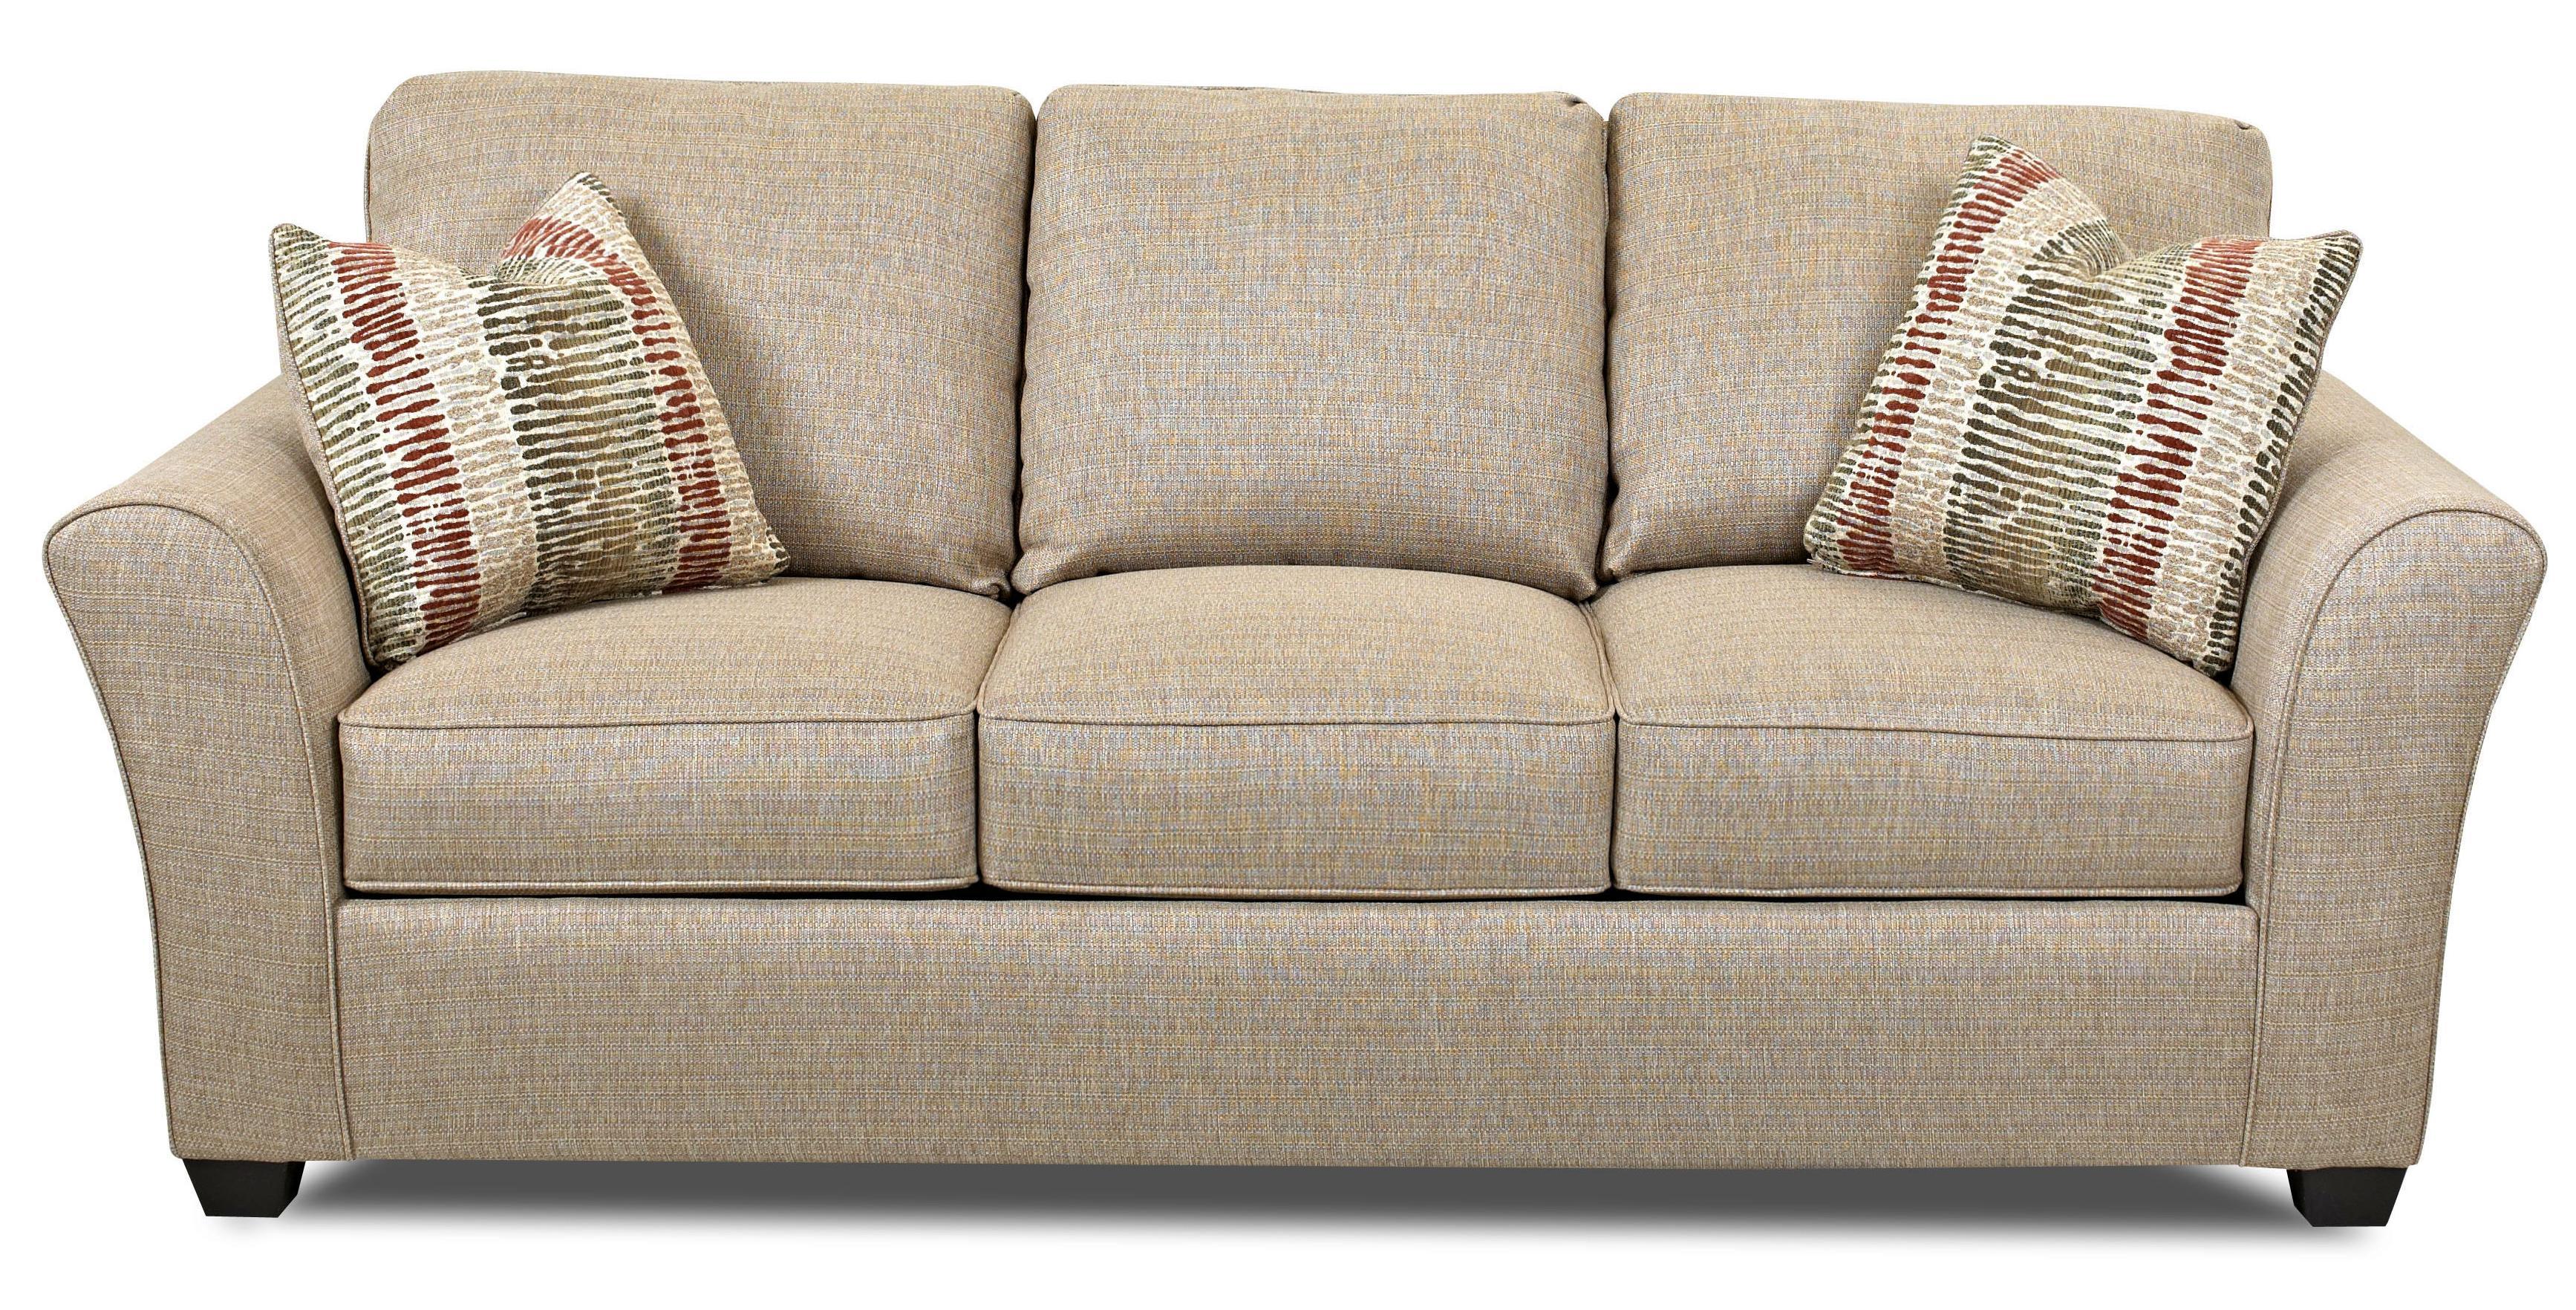 Klaussner Sedgewick Transitional Sofa - Item Number: K22200 S